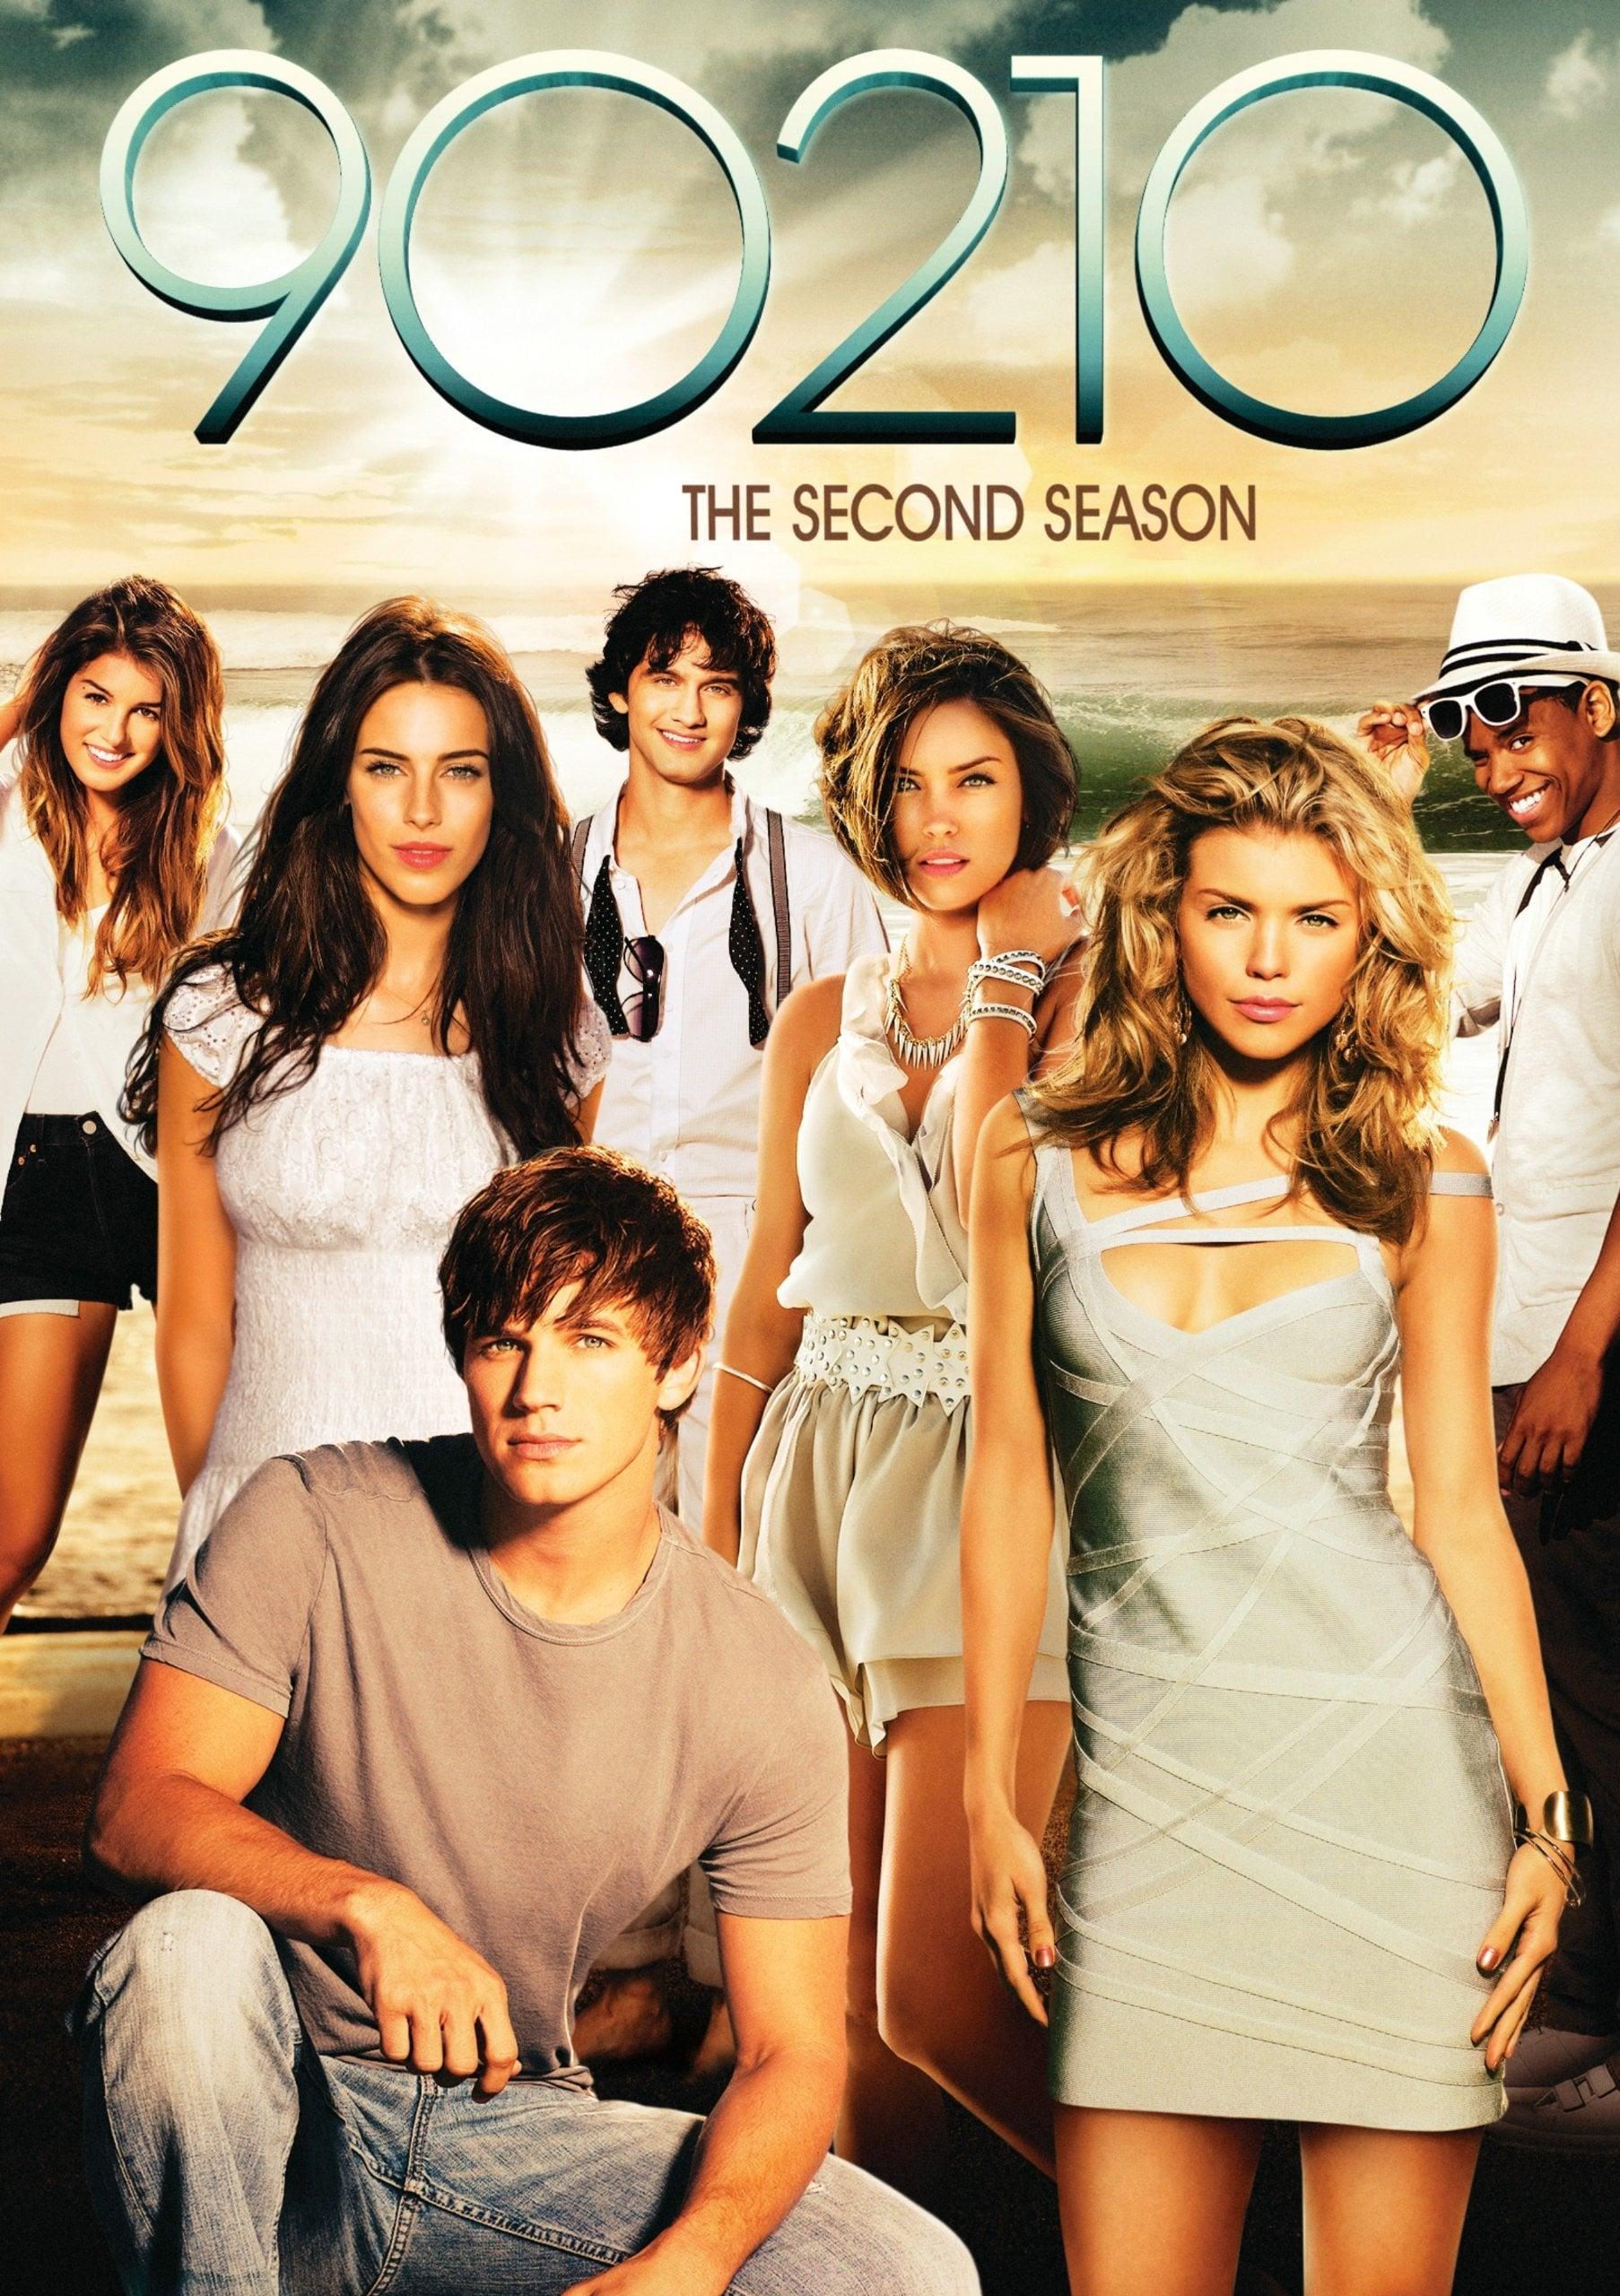 Torrent 90210 season 5 episode 1